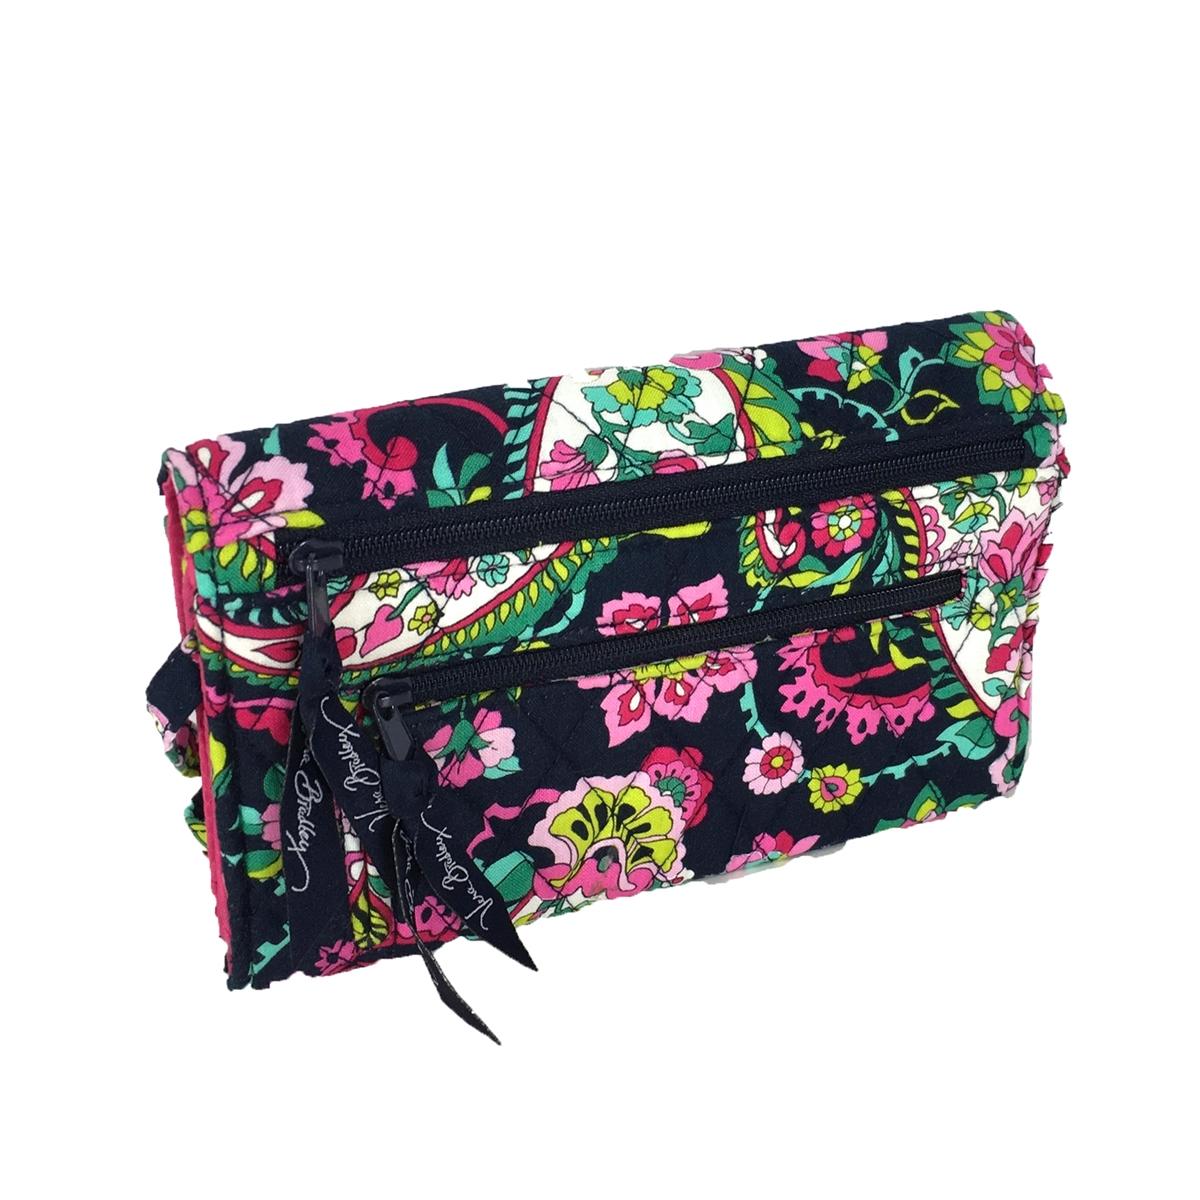 13b76c98f Vera Bradley Strap Wallet Crossbody Bag, Petal Paisley